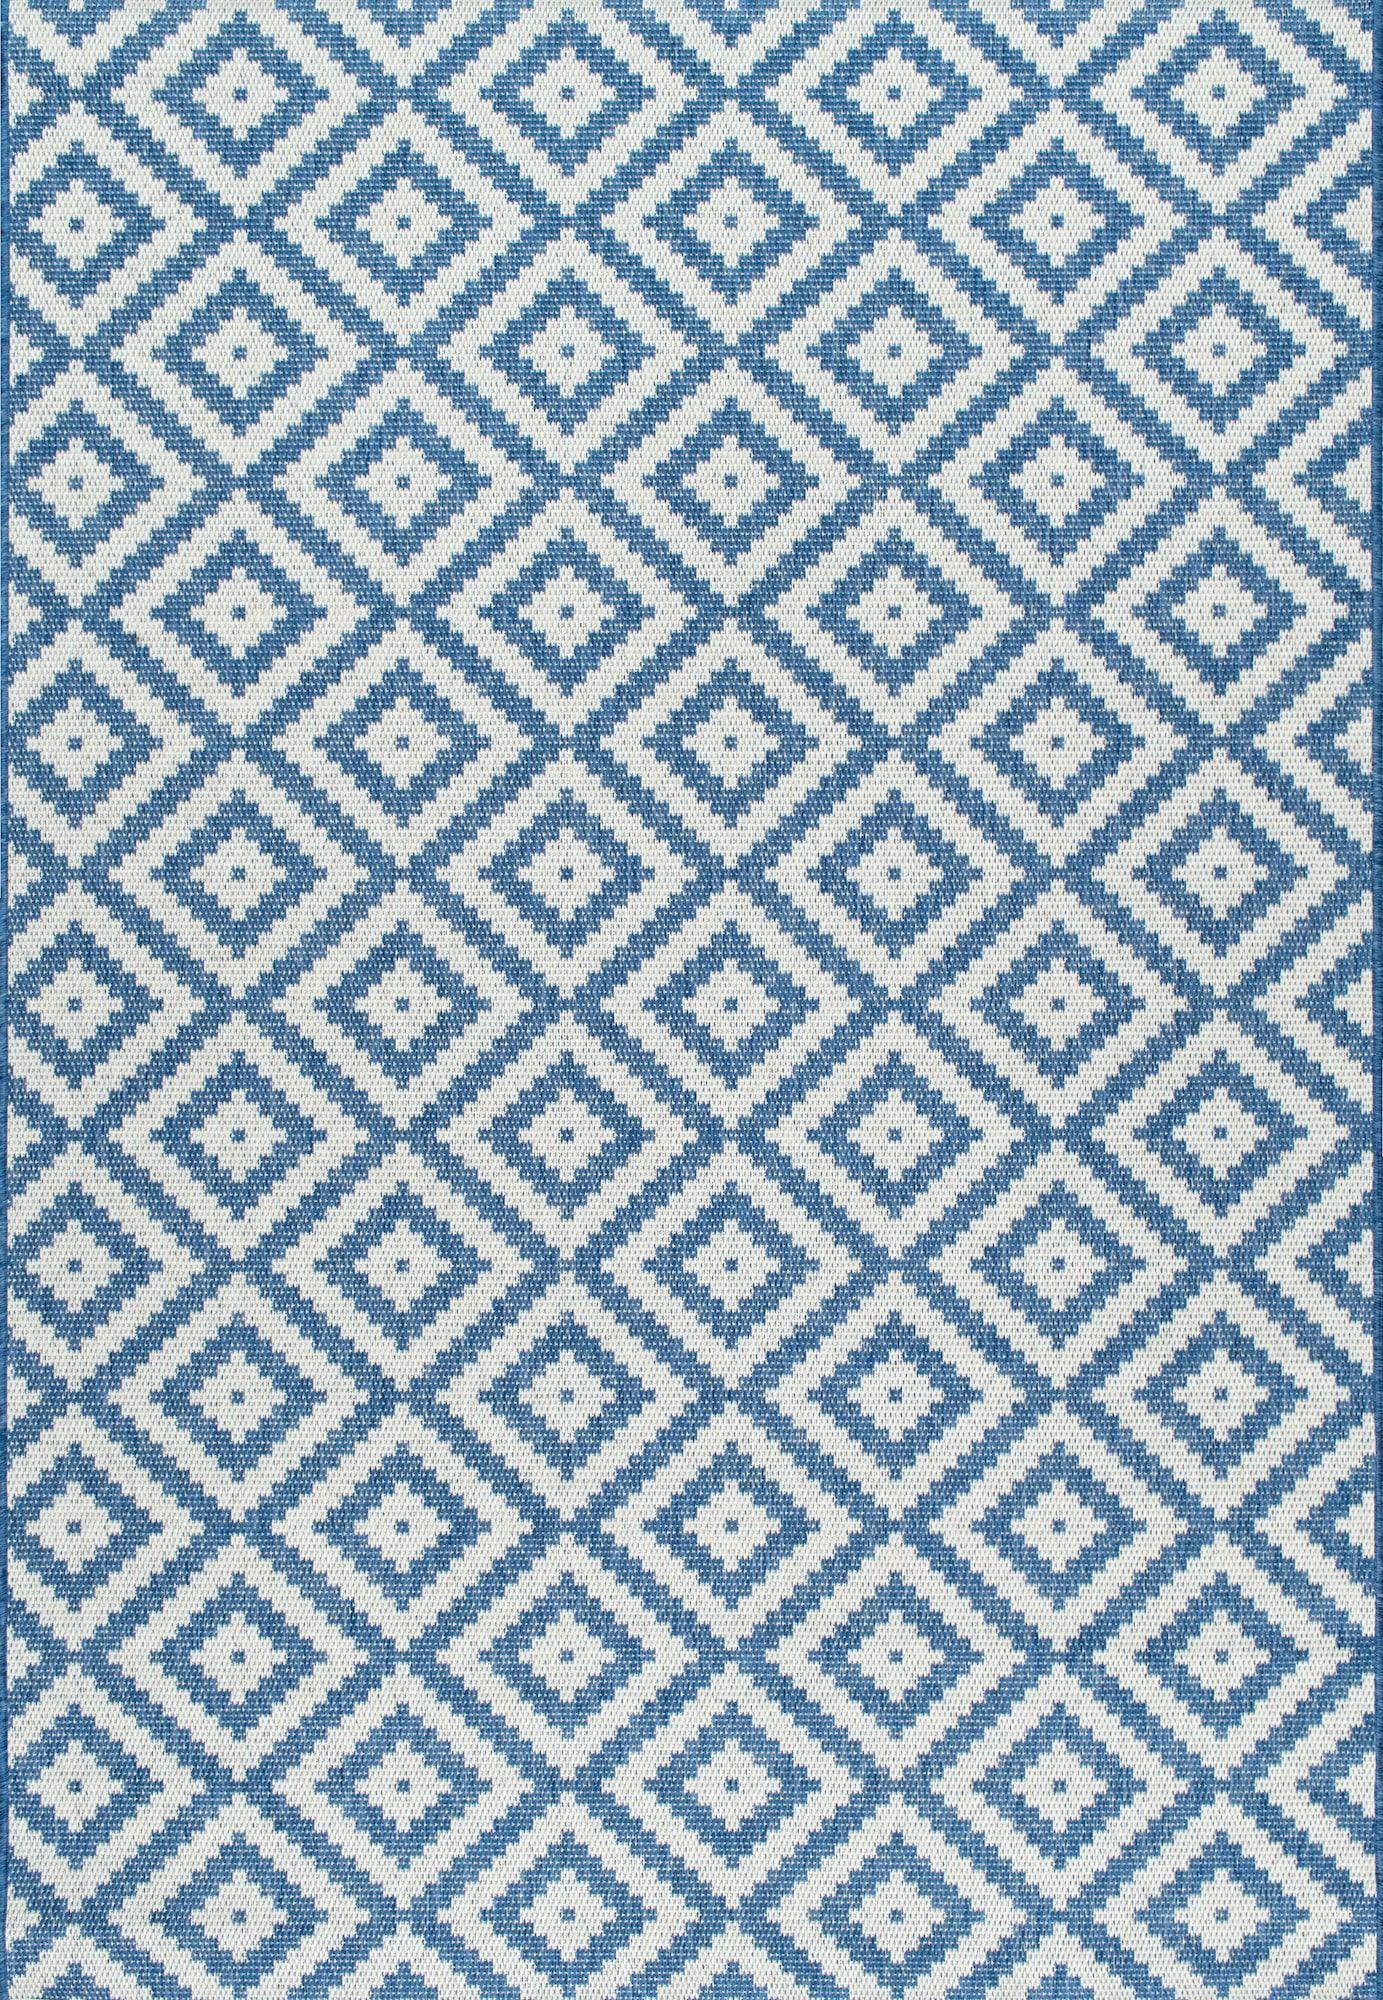 Rugs Usa Blue Aperto Outdoor Tribal Diamond Trellis Rug